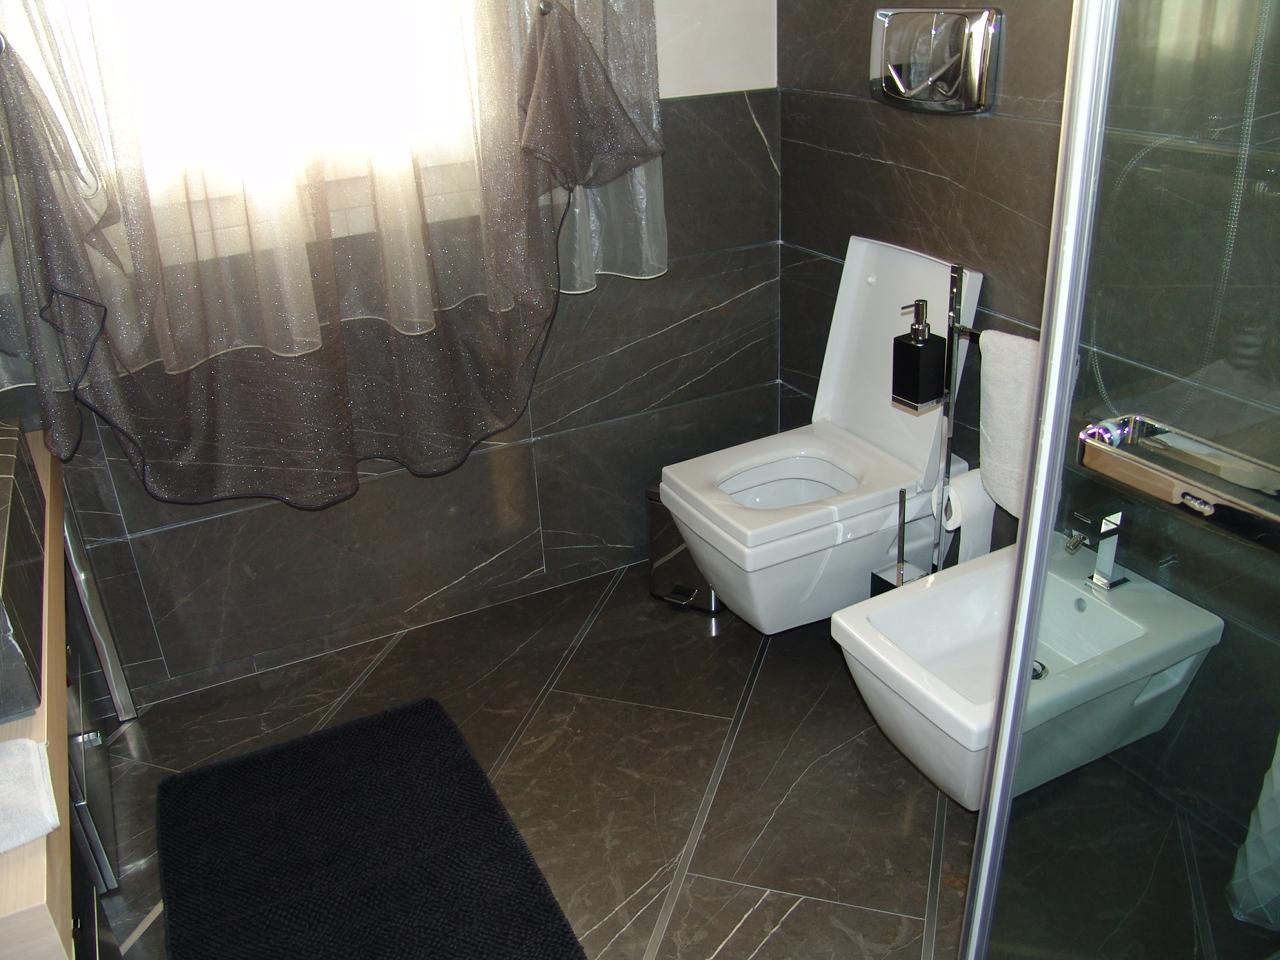 foto di bellissimi bagni in marmo e pietra venduti dalla zem ... - Bagni Belli Moderni